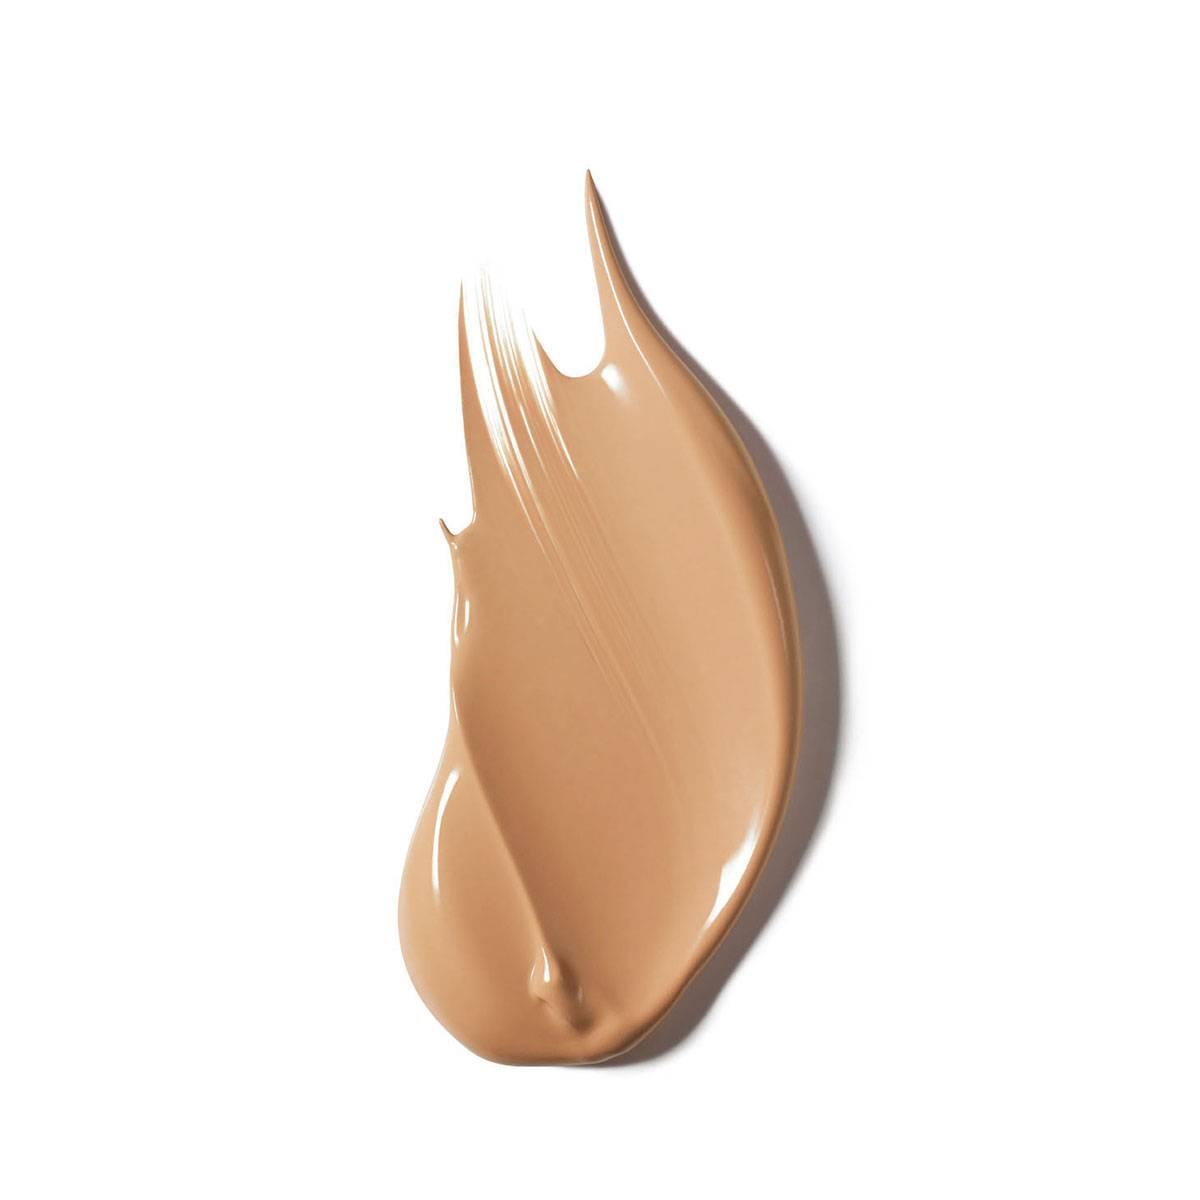 La Roche Posay Citlivá Toleriane Make-up CREAM_FOUNDATION_03SANDBEIG